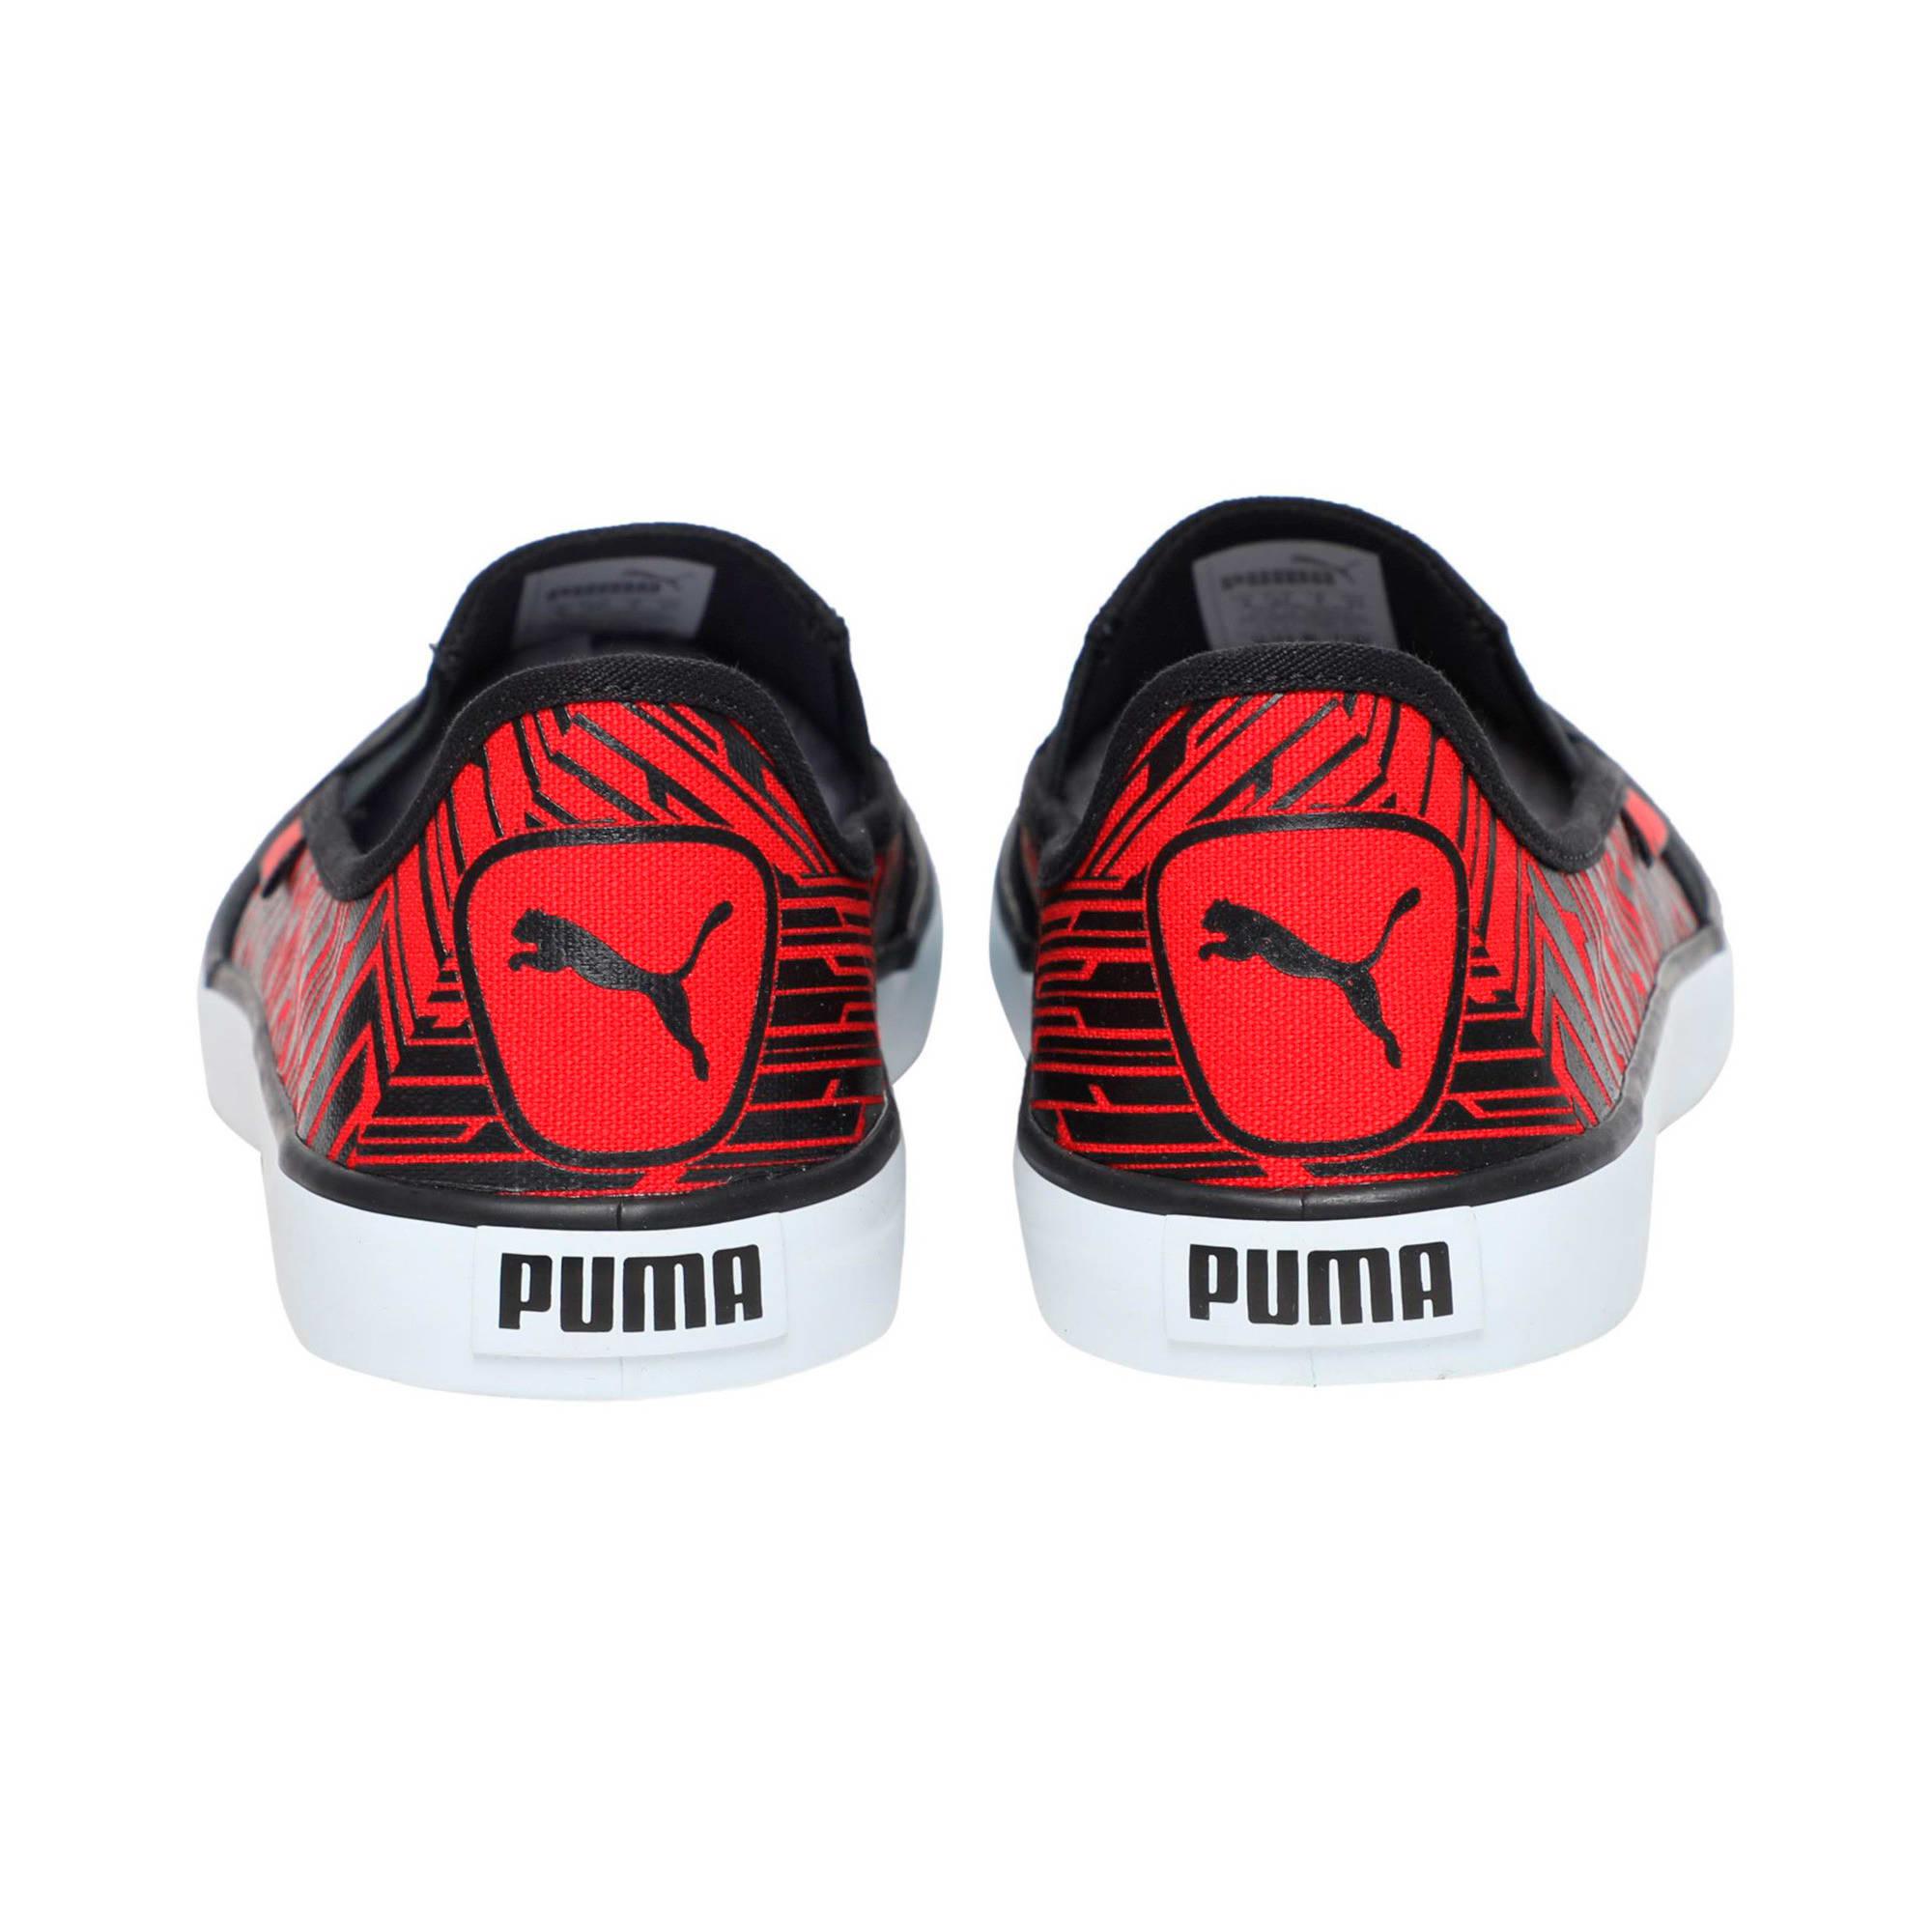 Thumbnail 3 of Campario IDP, Puma Black-High Risk Red, medium-IND